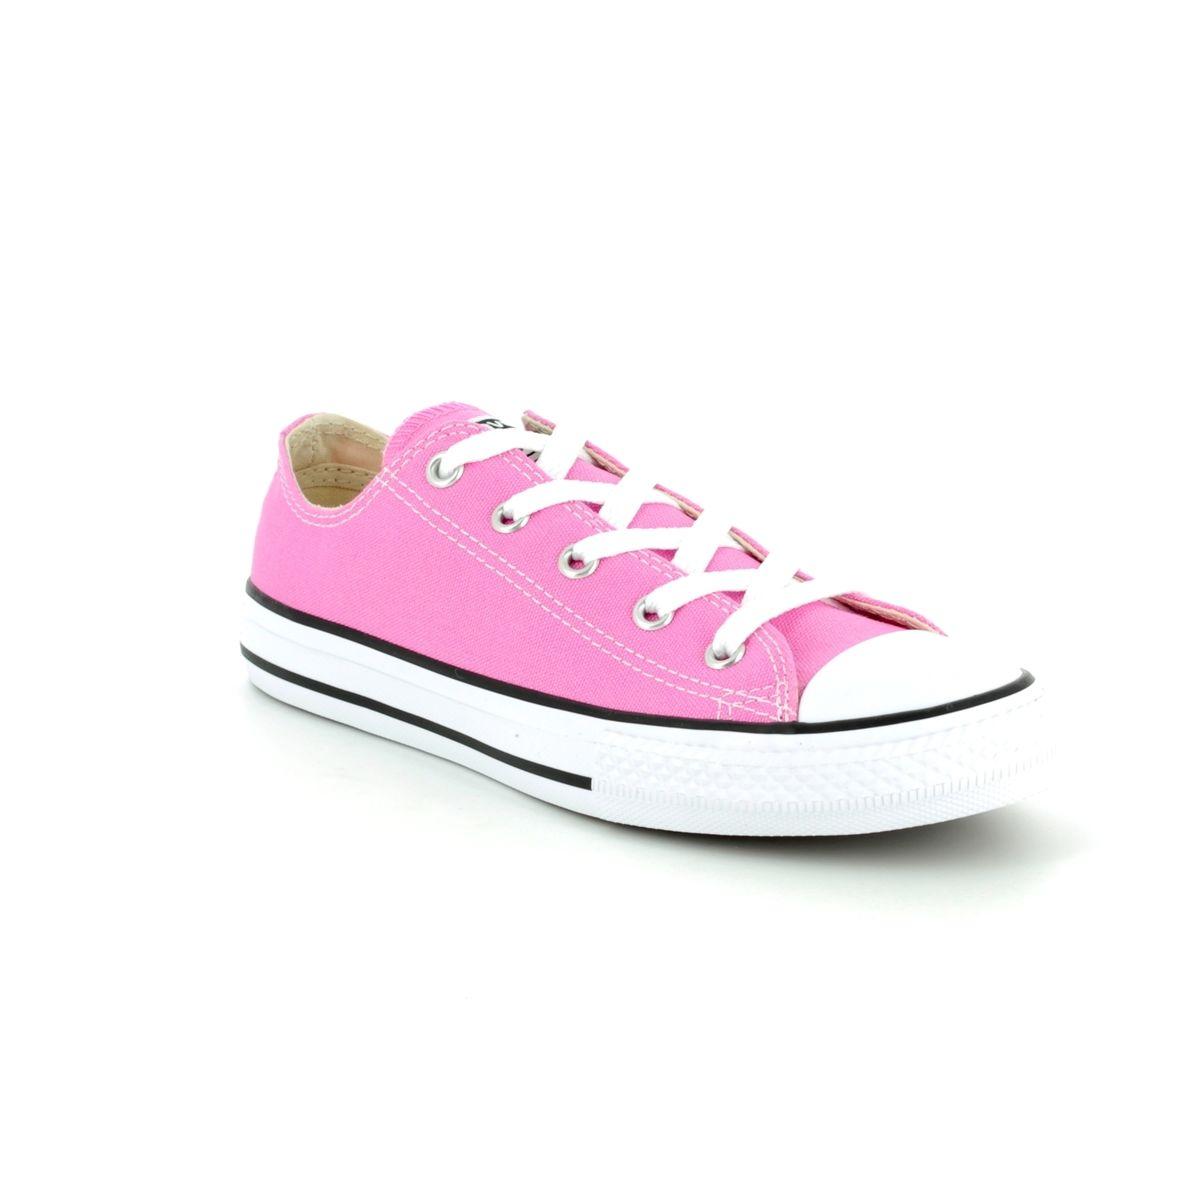 a9294ffa8b0 Converse All Star Ox Junior 3J238C Pink Girls Trainers